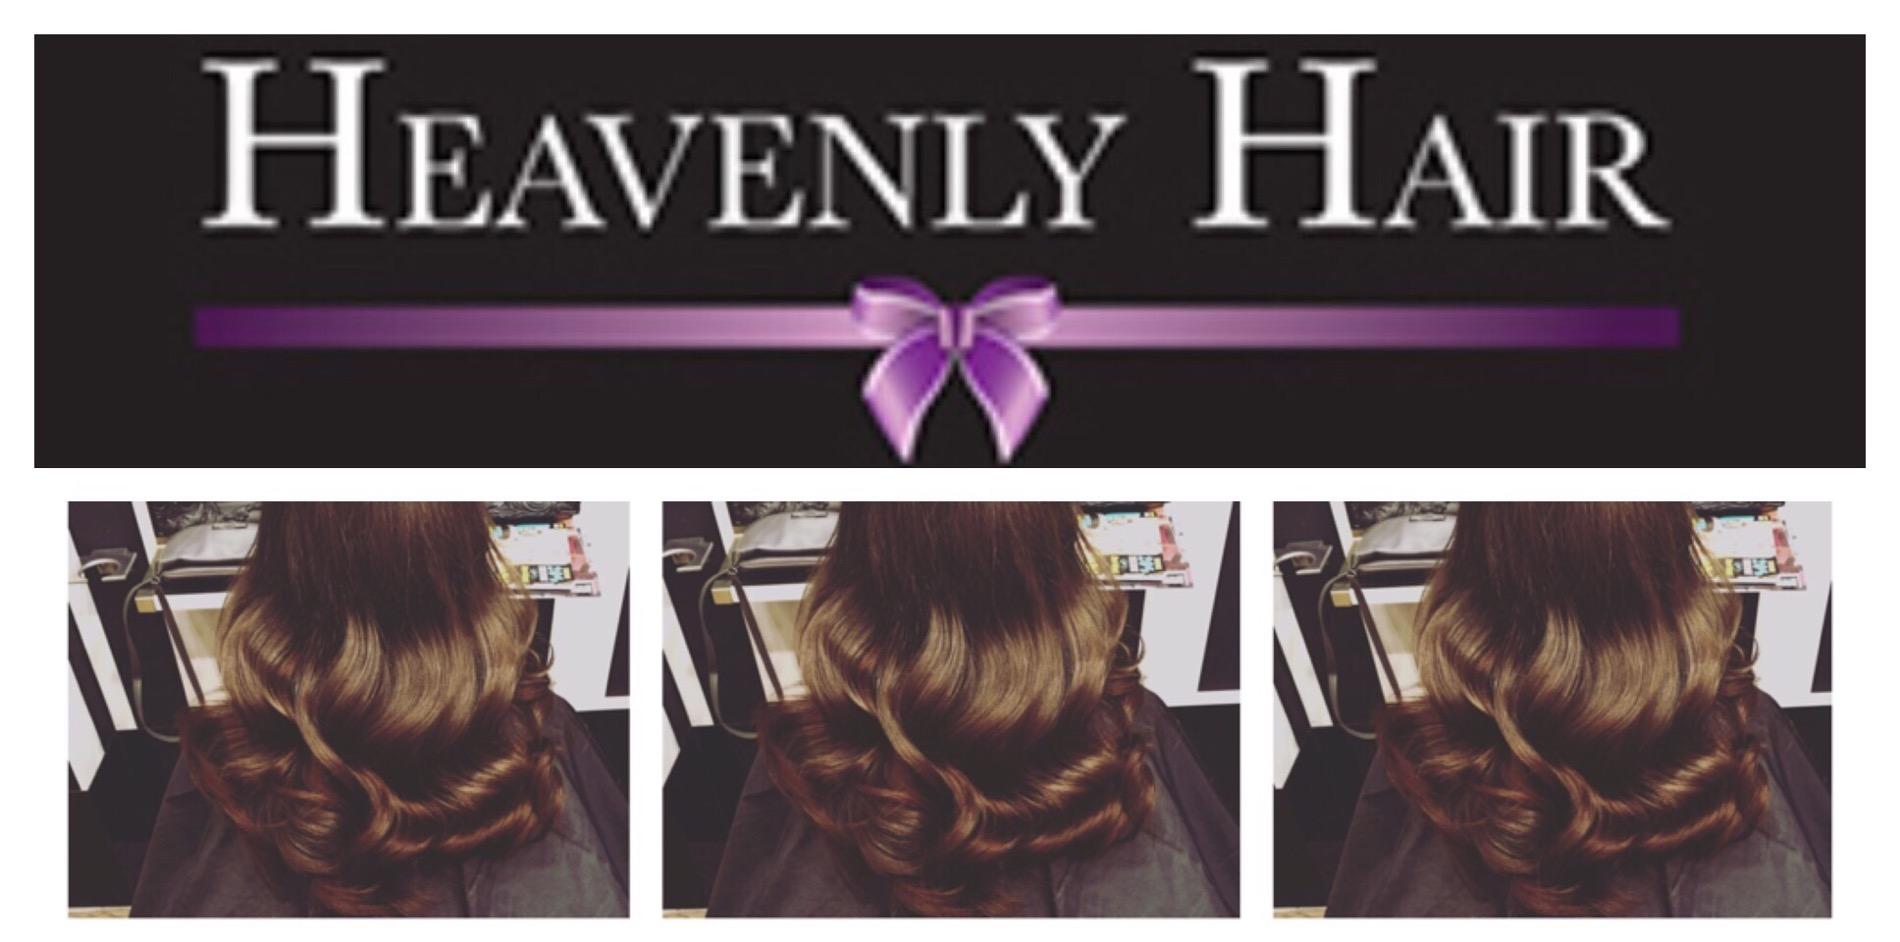 My visit to heavenly hair salon the halo hairpiece my visit to heavenly hair salon the halo hairpiece pmusecretfo Choice Image